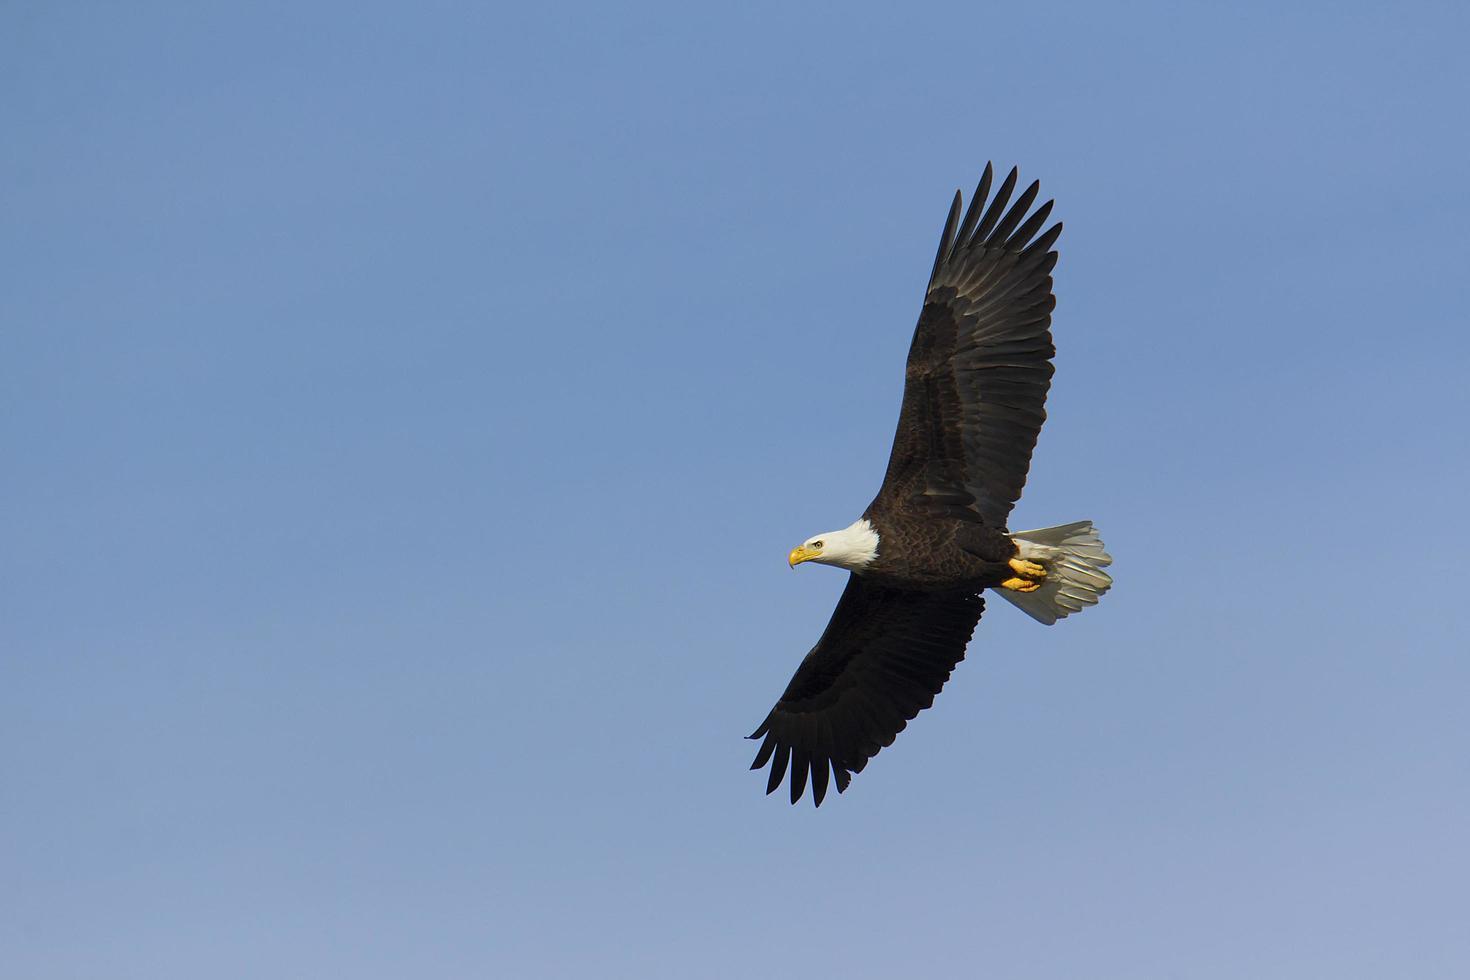 águia-careca adulta sobrevoa foto